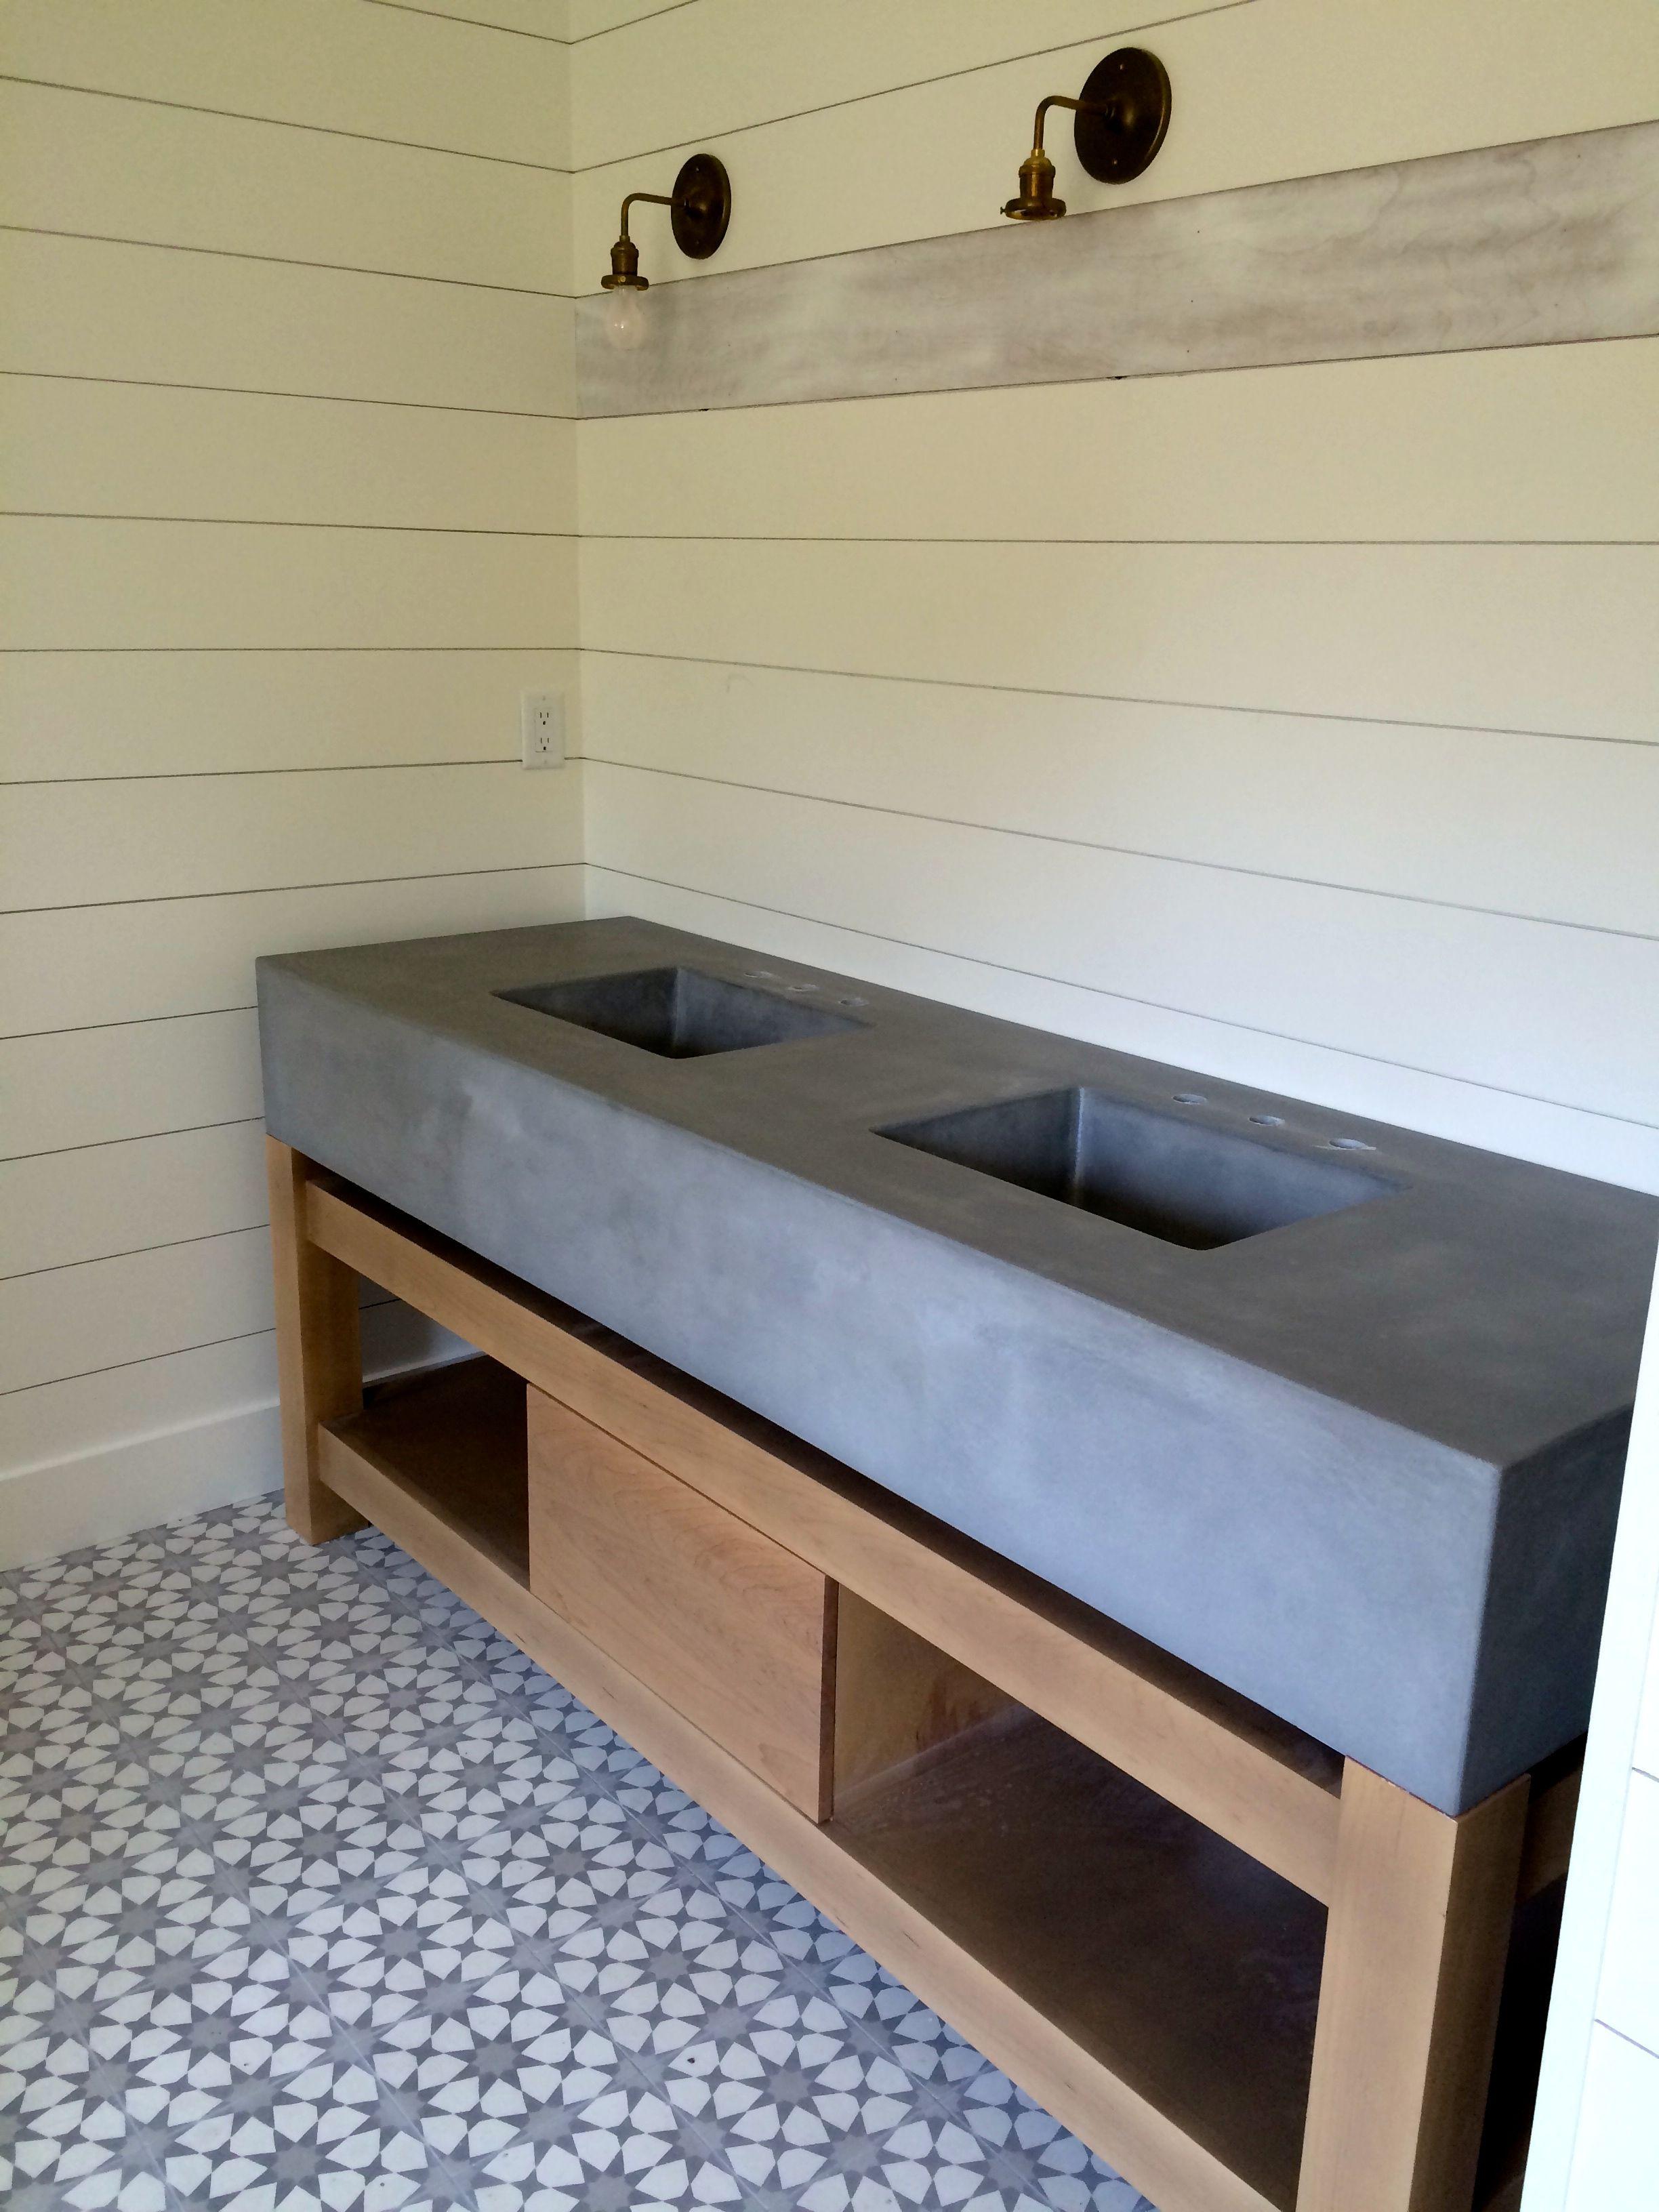 Customized Concrete Bathroom Sinks and Vanities ...